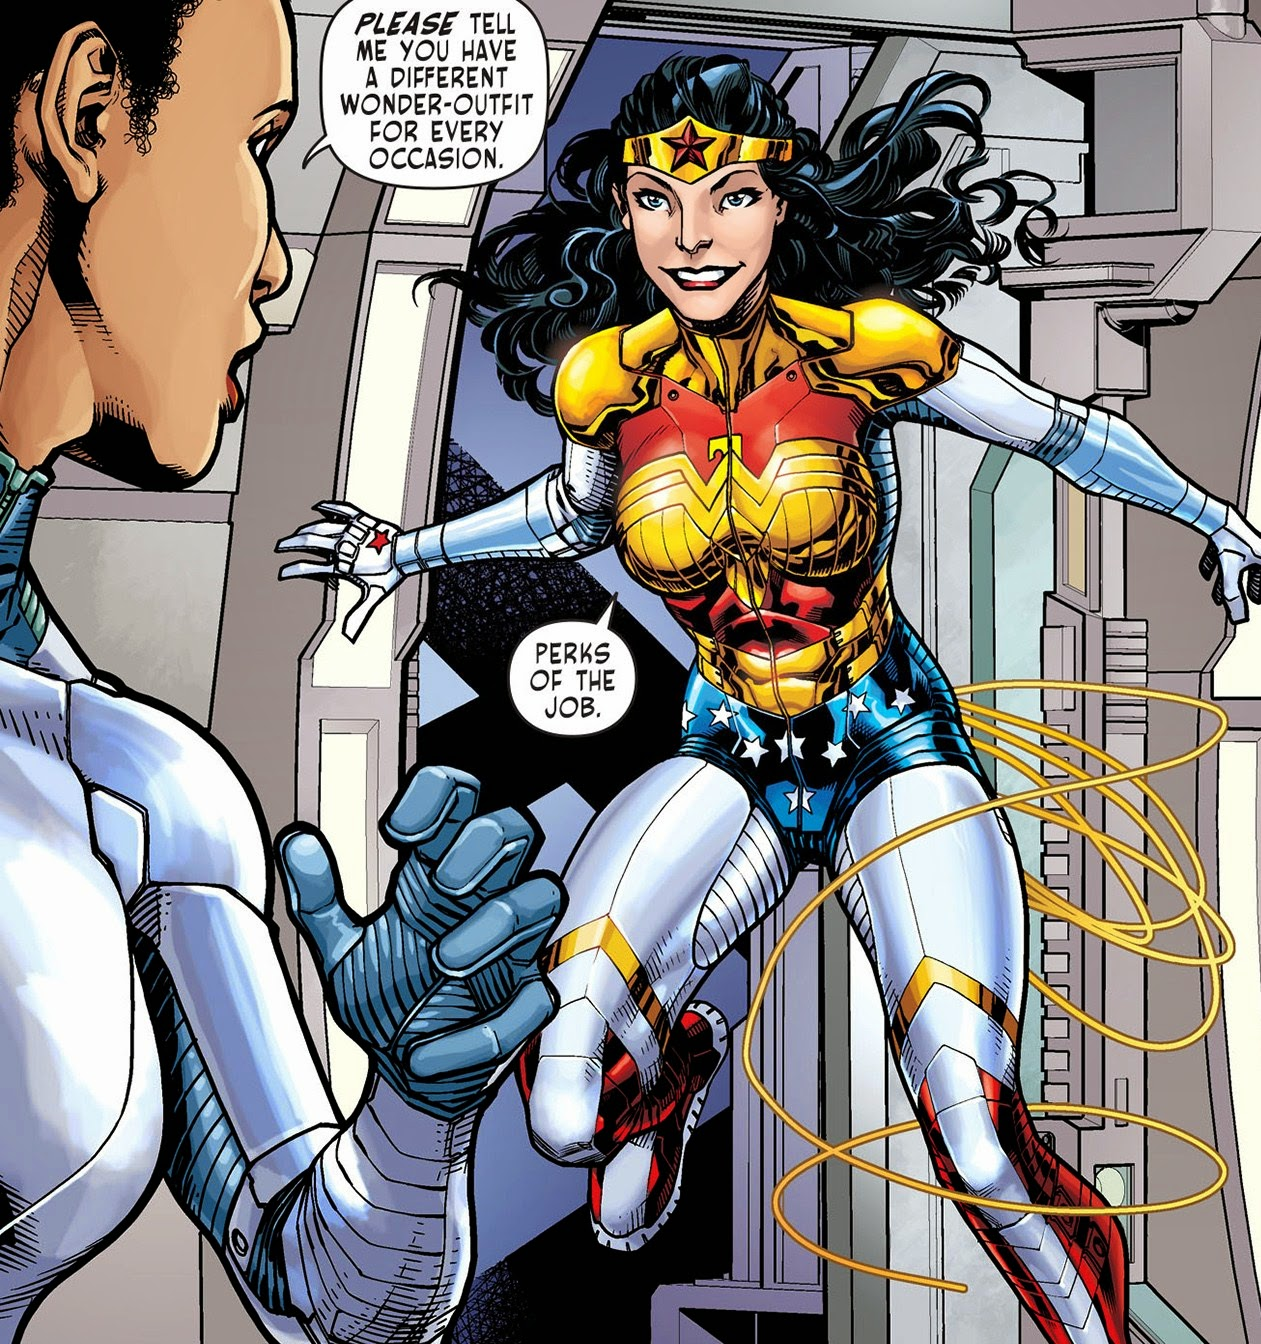 Sensation Comics Featuring Wonder Woman - Alex de Campi - Neil Googe 2